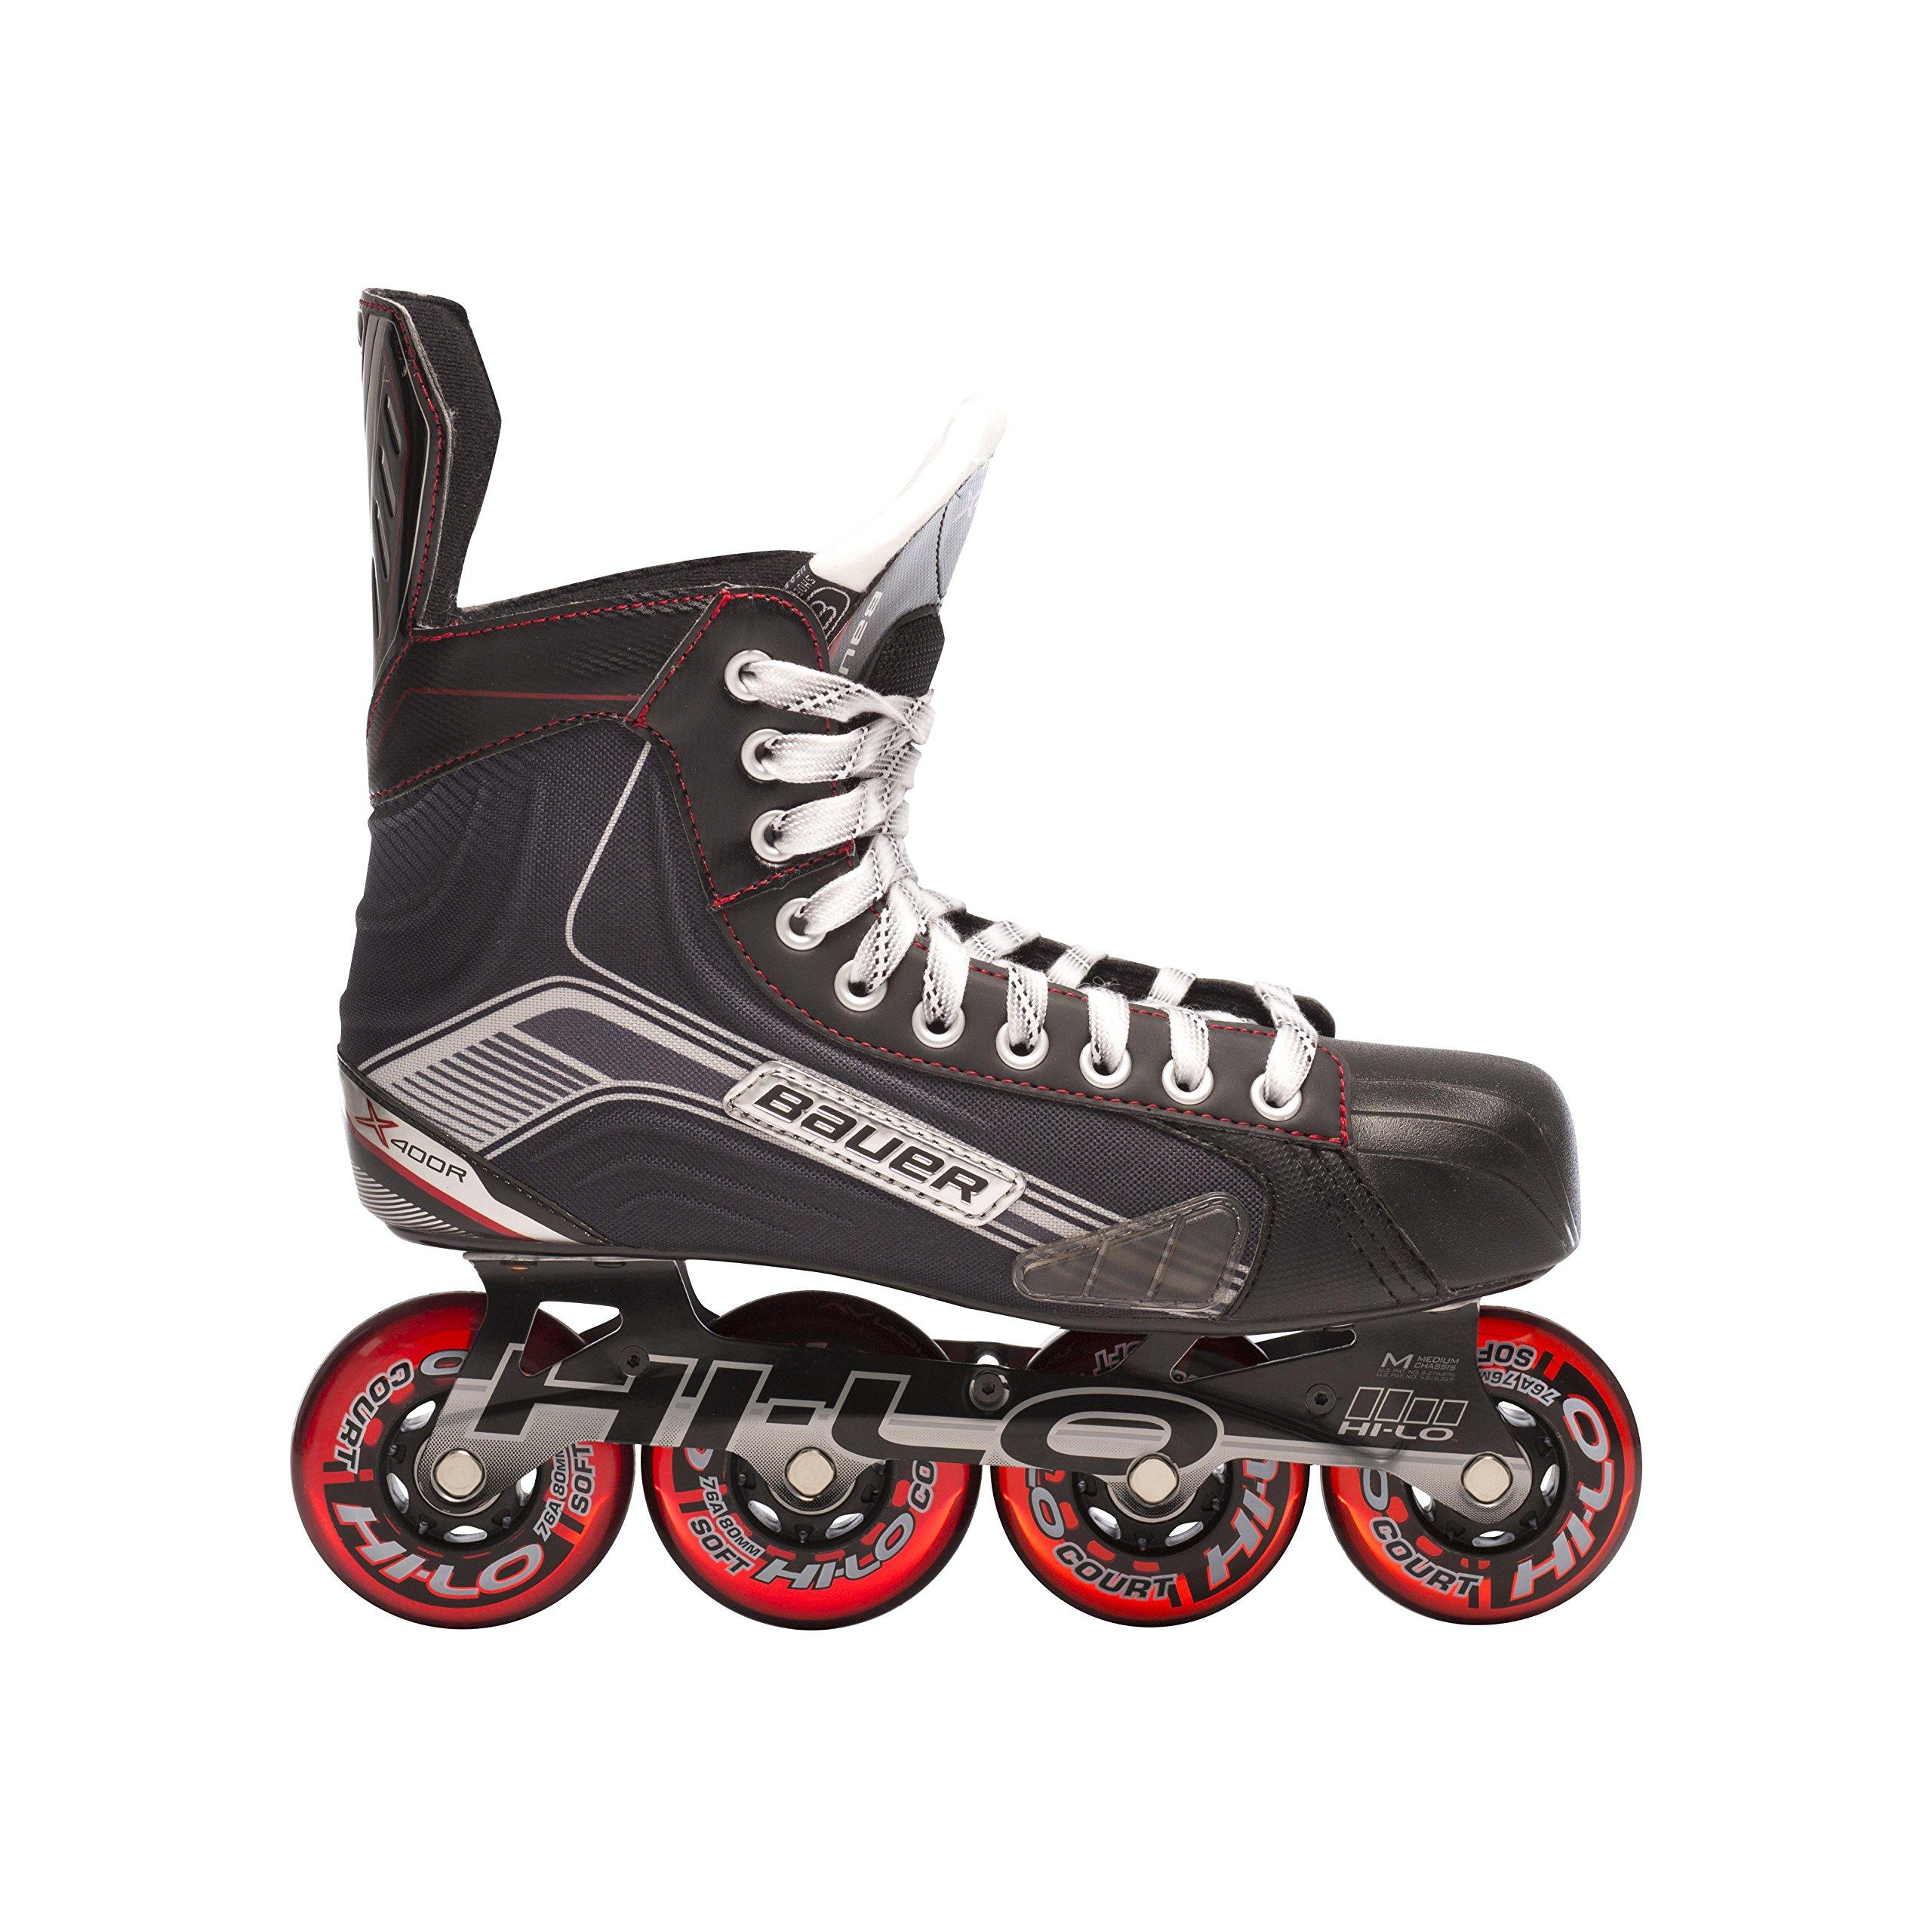 Bauer Junior Vapor X400R Roller Hockey Skate, Black, Size 3